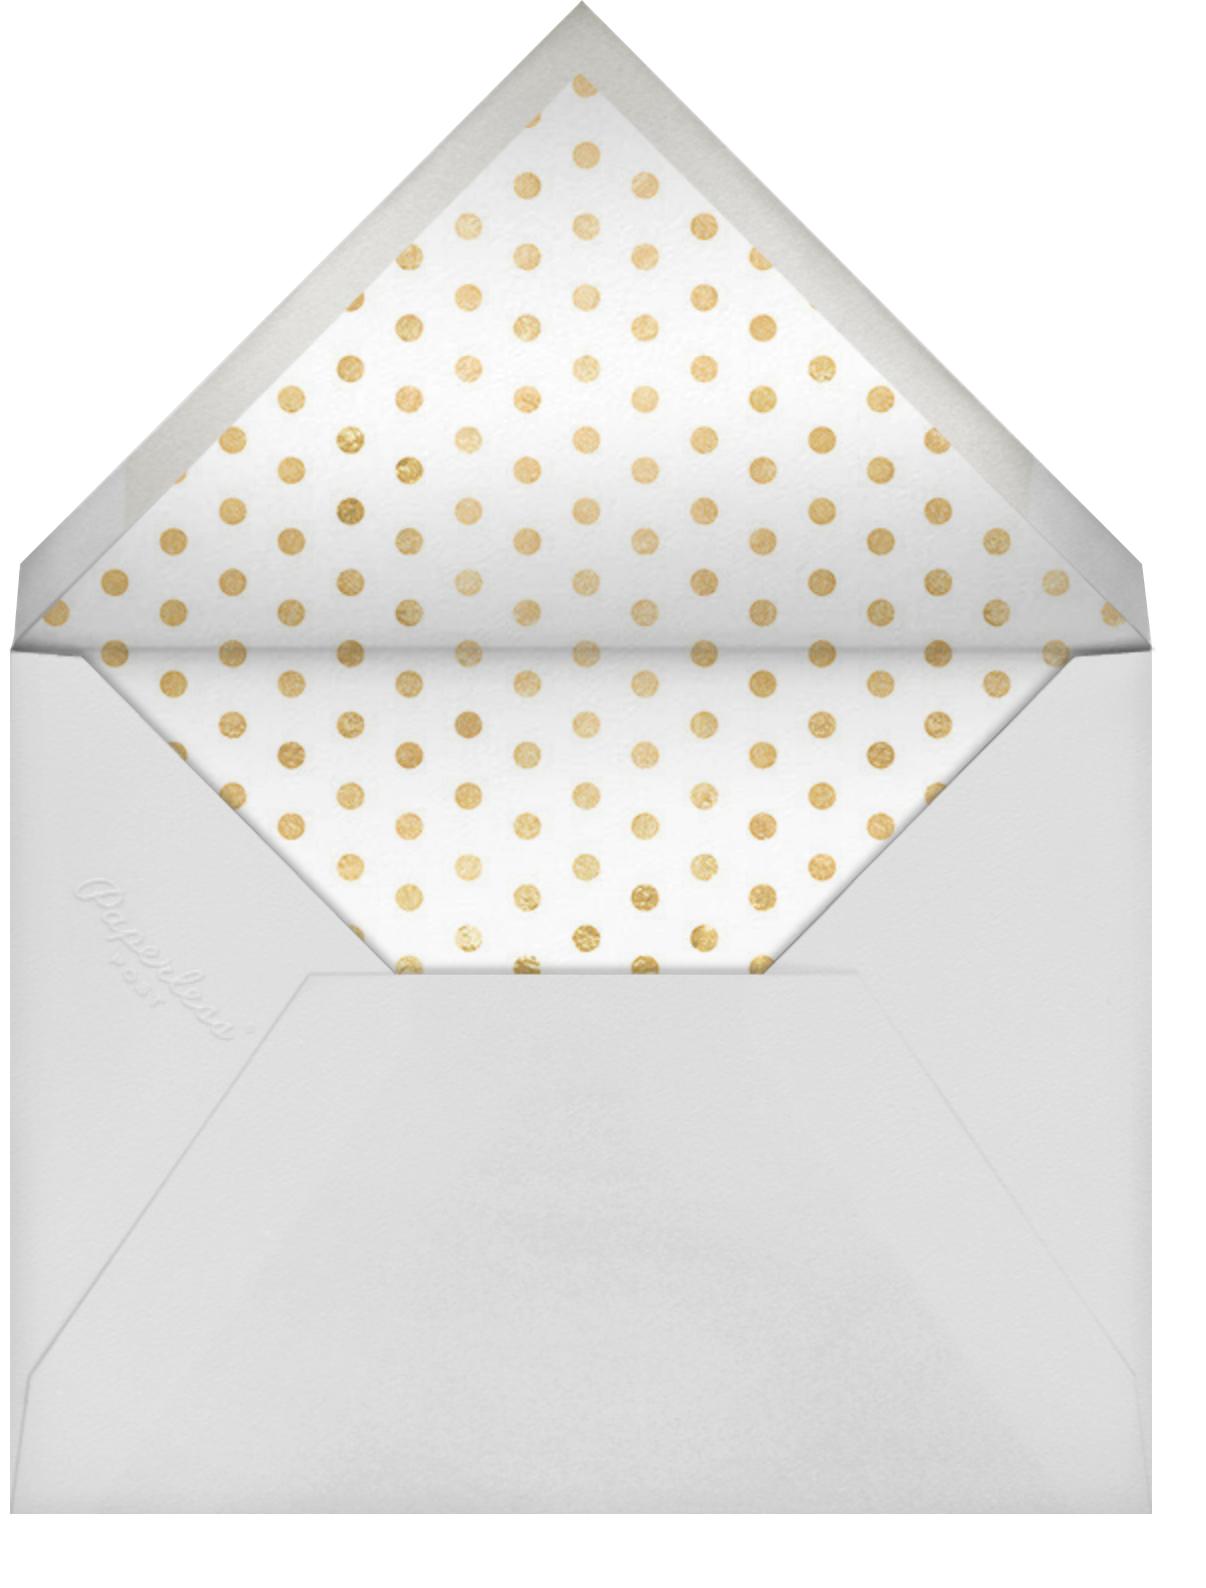 Princess Cake - Rifle Paper Co. - Congratulations - envelope back